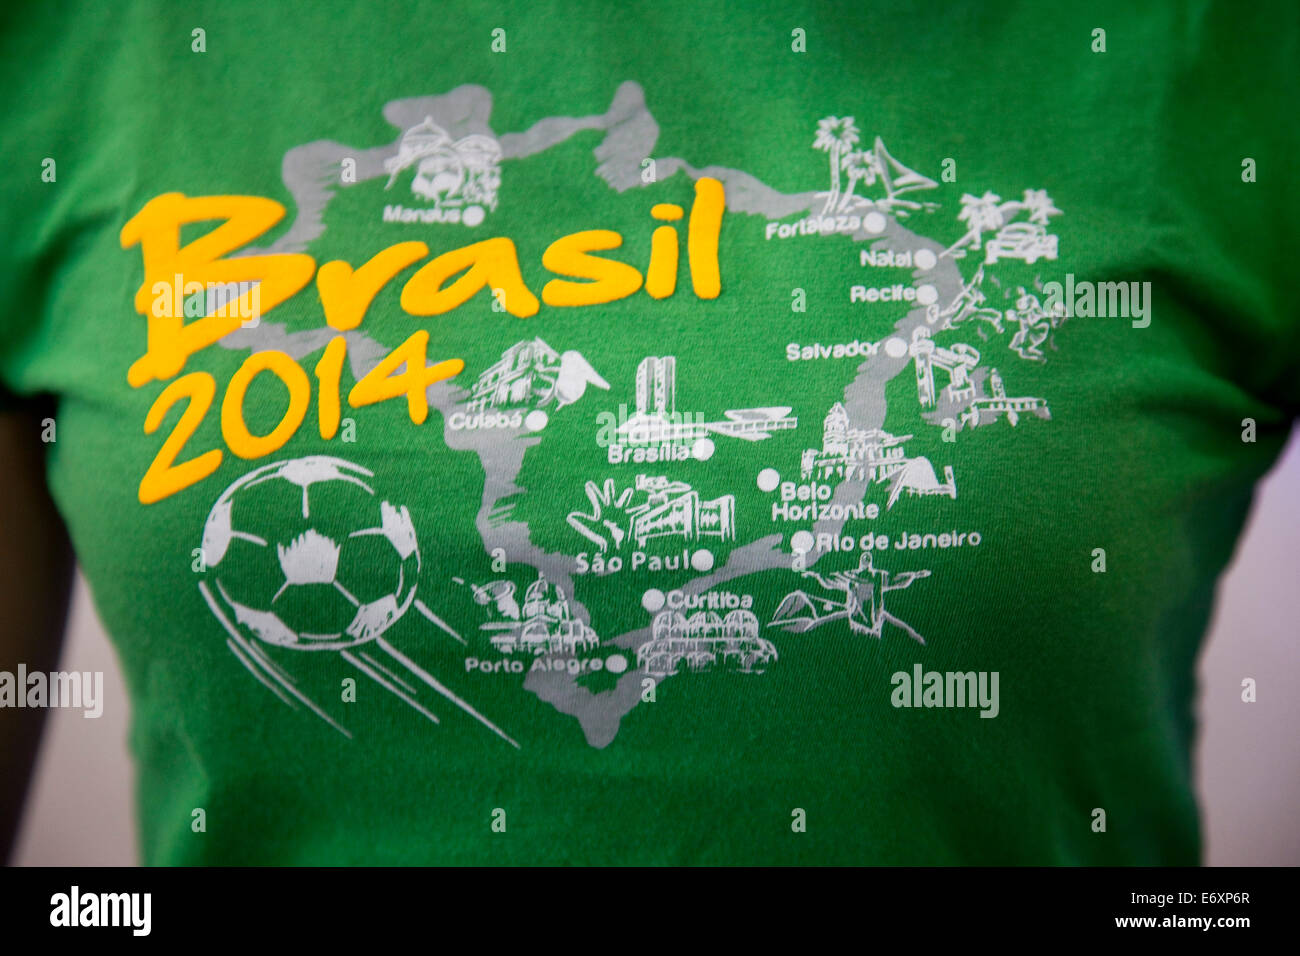 Woman wearing Brasil 2014 FIFA World Cup soccer shirt, Olinda, near Recife, Pernambuco, Brazil - Stock Image